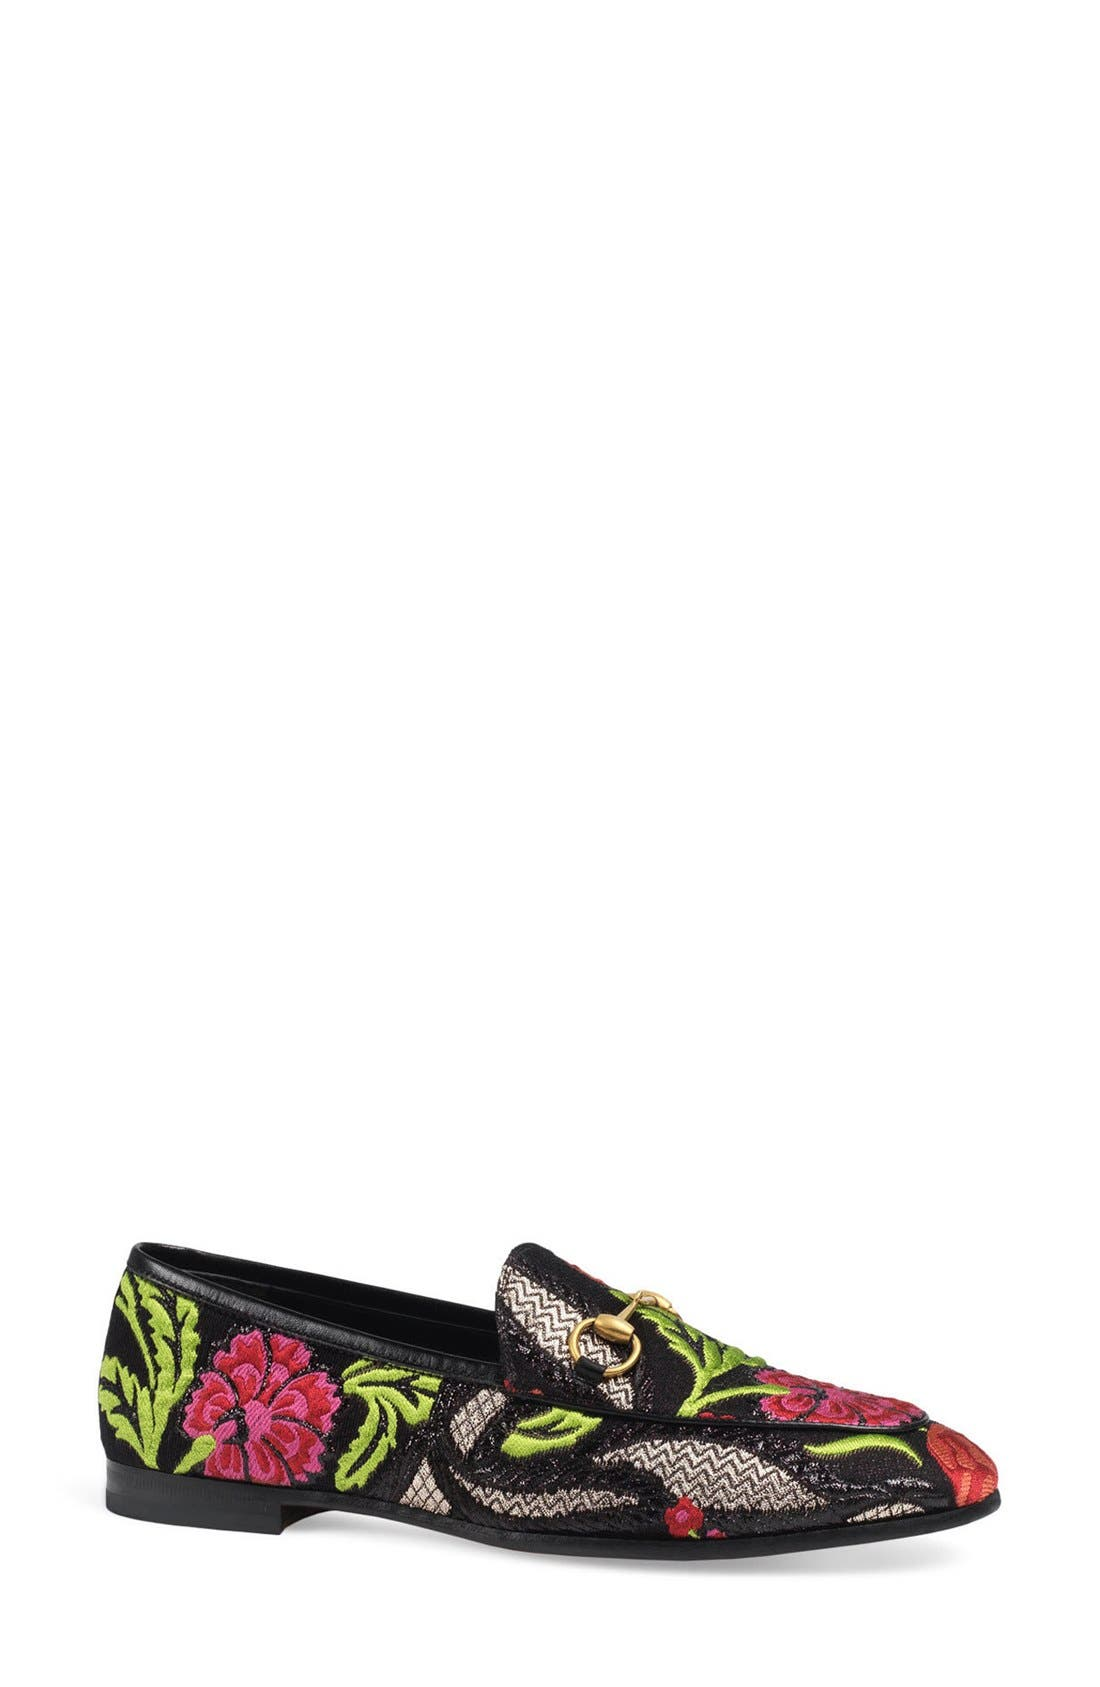 Alternate Image 1 Selected - Gucci 'Jordaan' Metallic Loafer (Women)